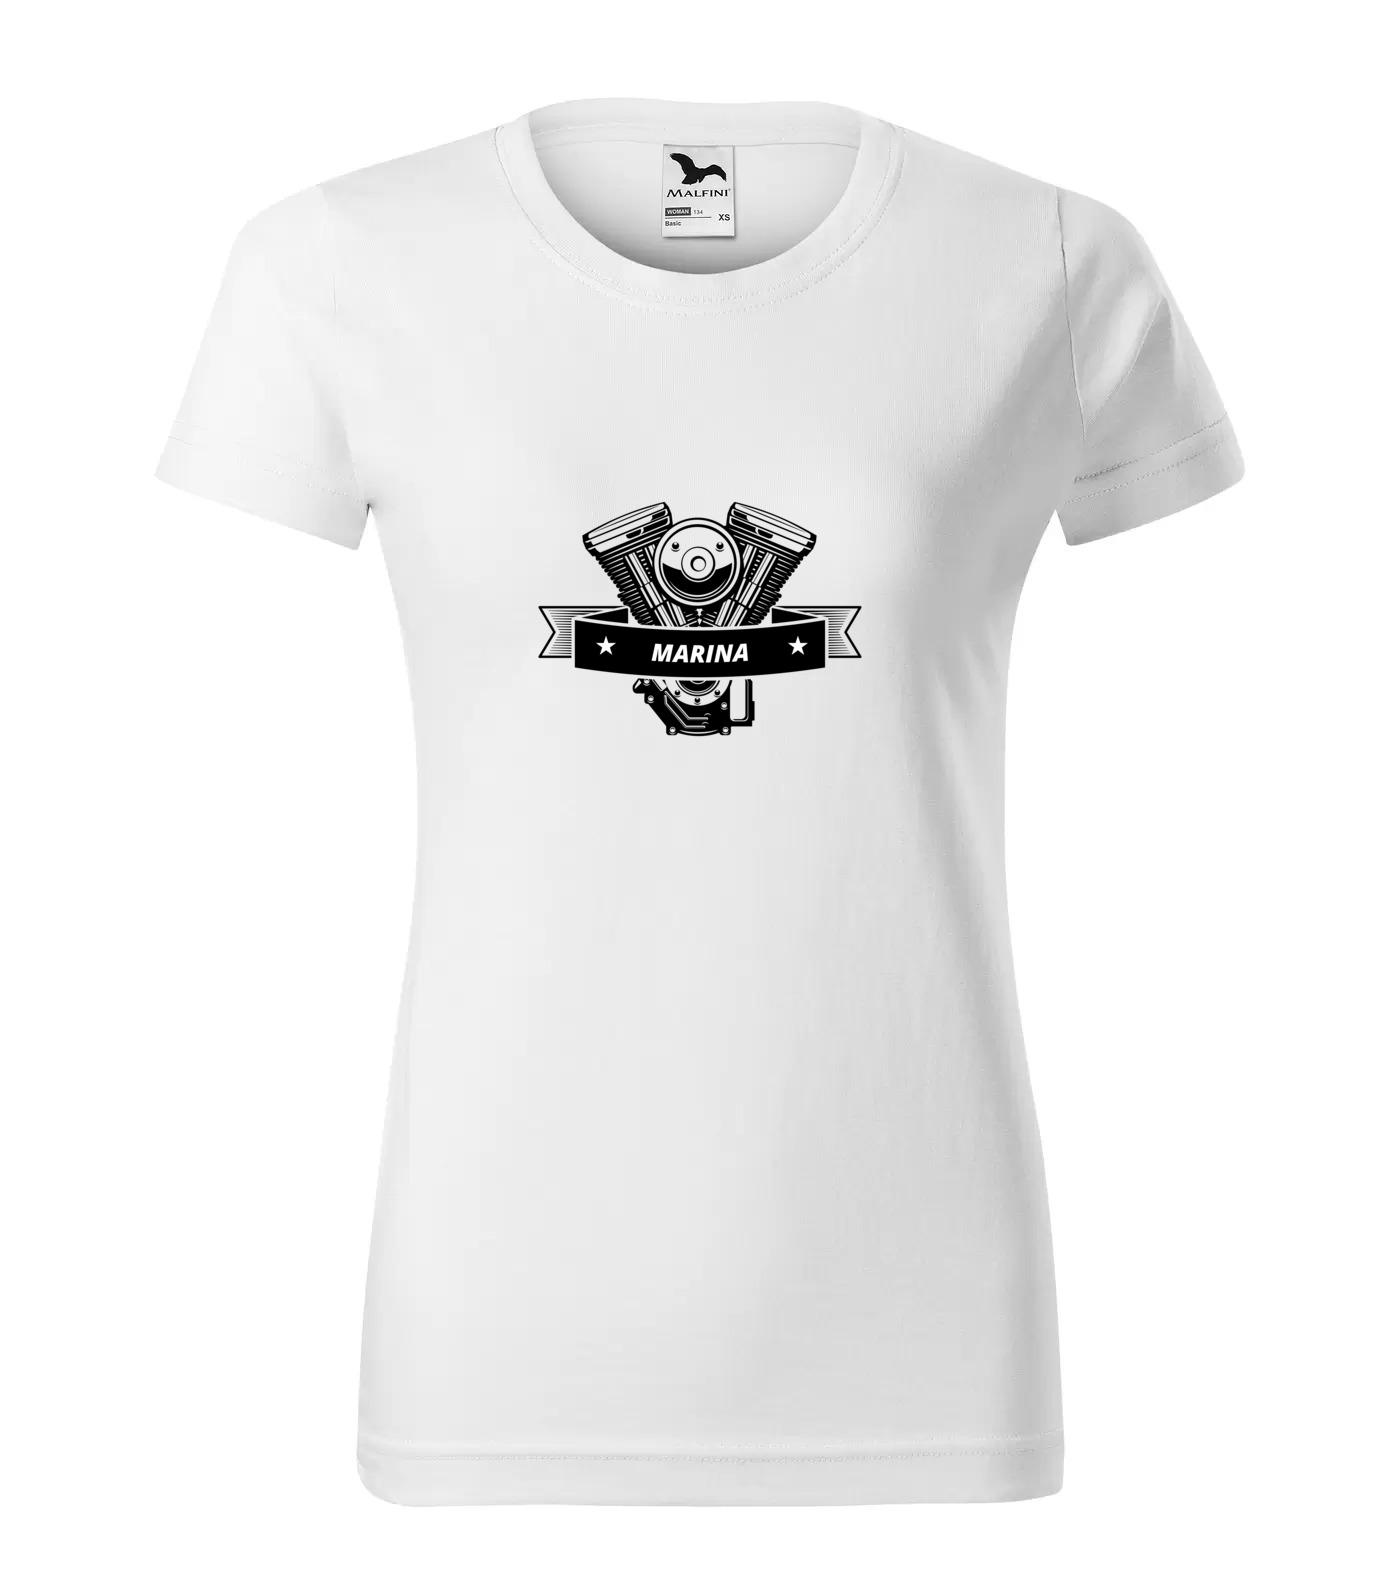 Tričko Motorkářka Marina